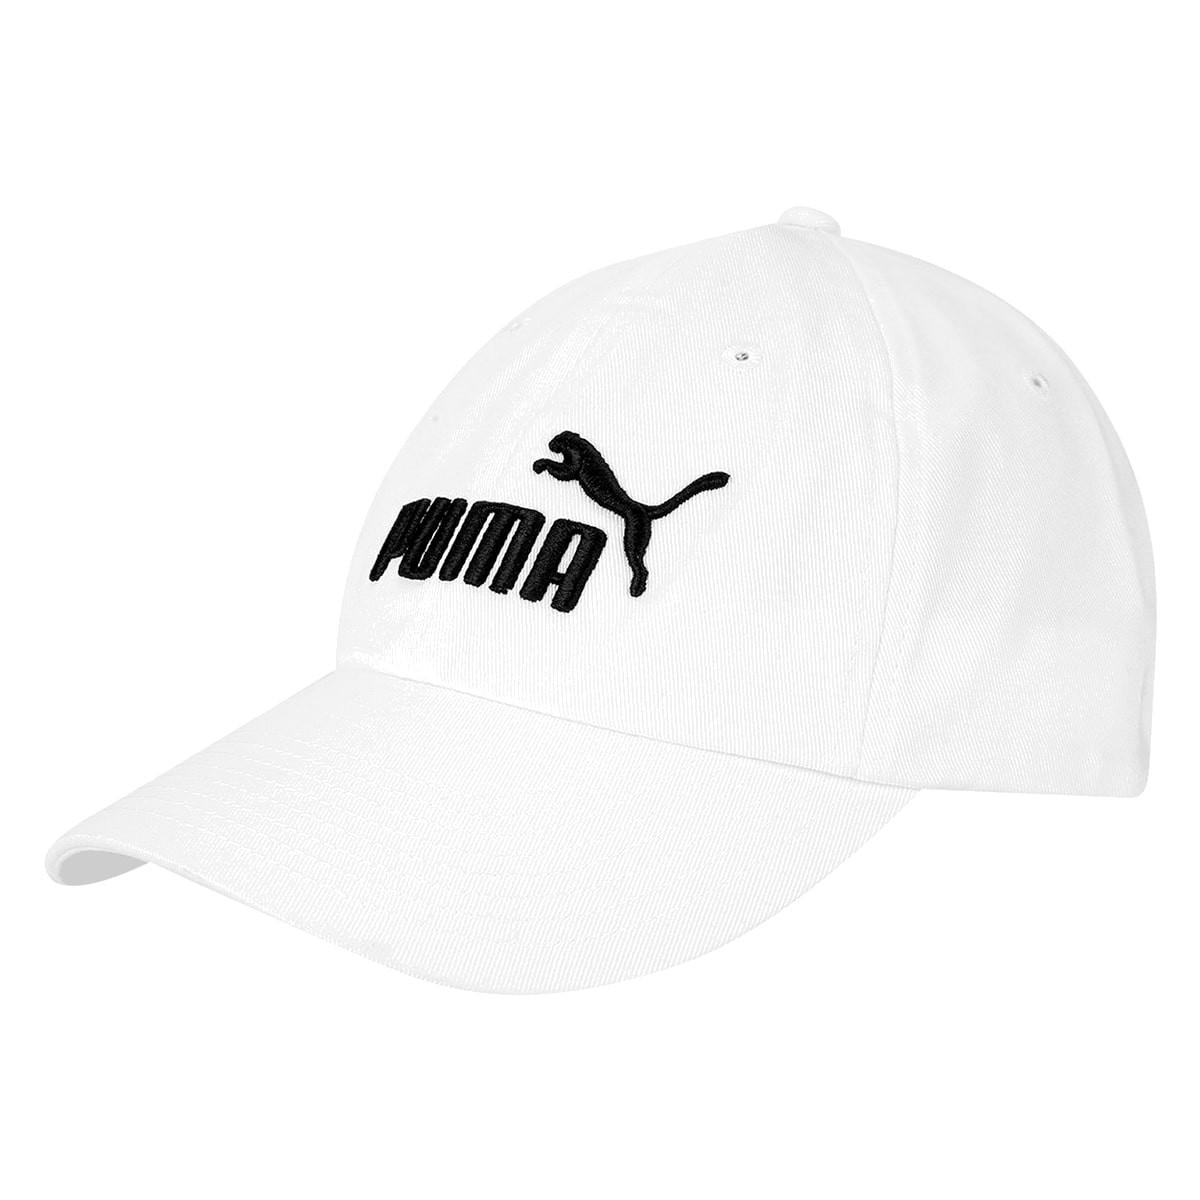 Boné Puma Aba Curva Ess Branco